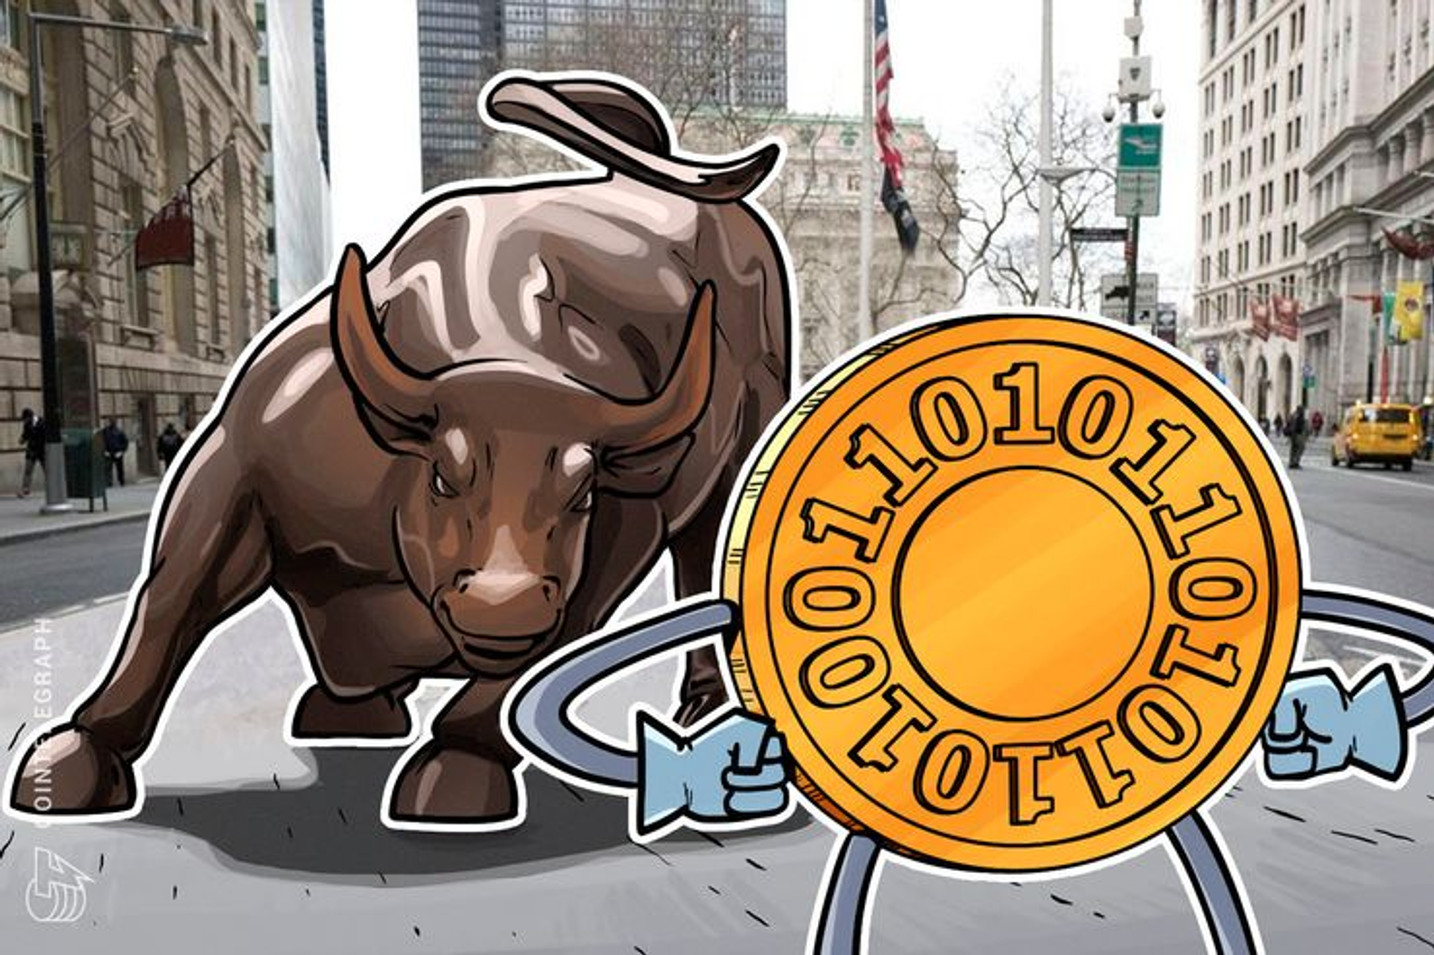 RSIが示す市場センチメントは未だ低水準 仮想通貨ビットコイン相場市況(12月5日)